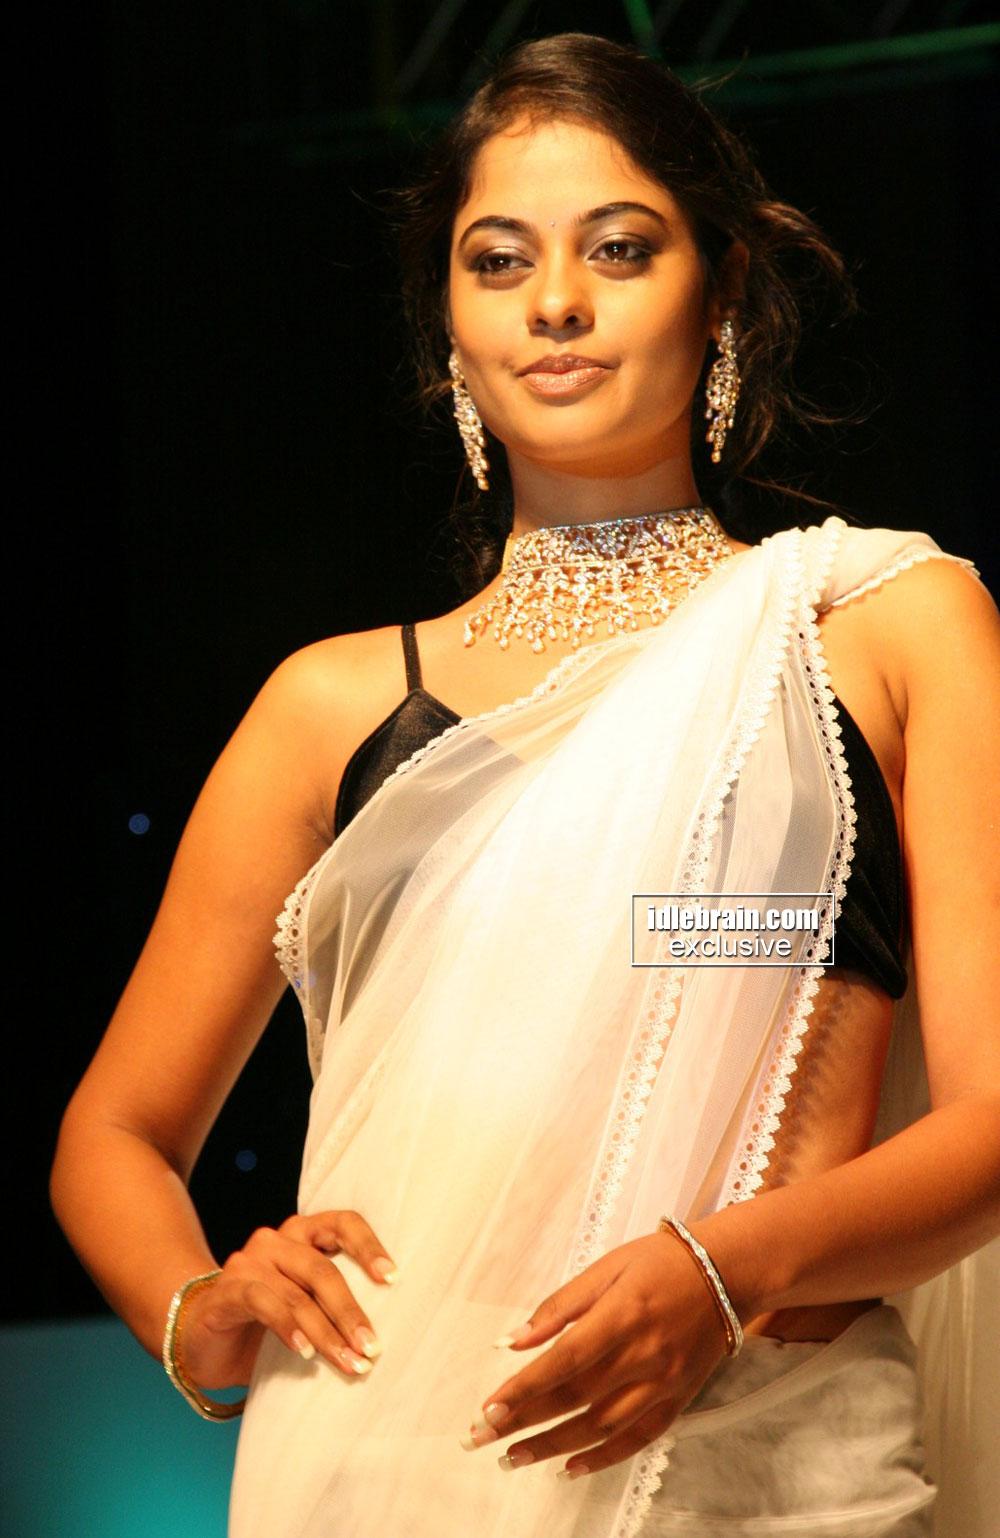 Picasa - Download Actress divya bharti images